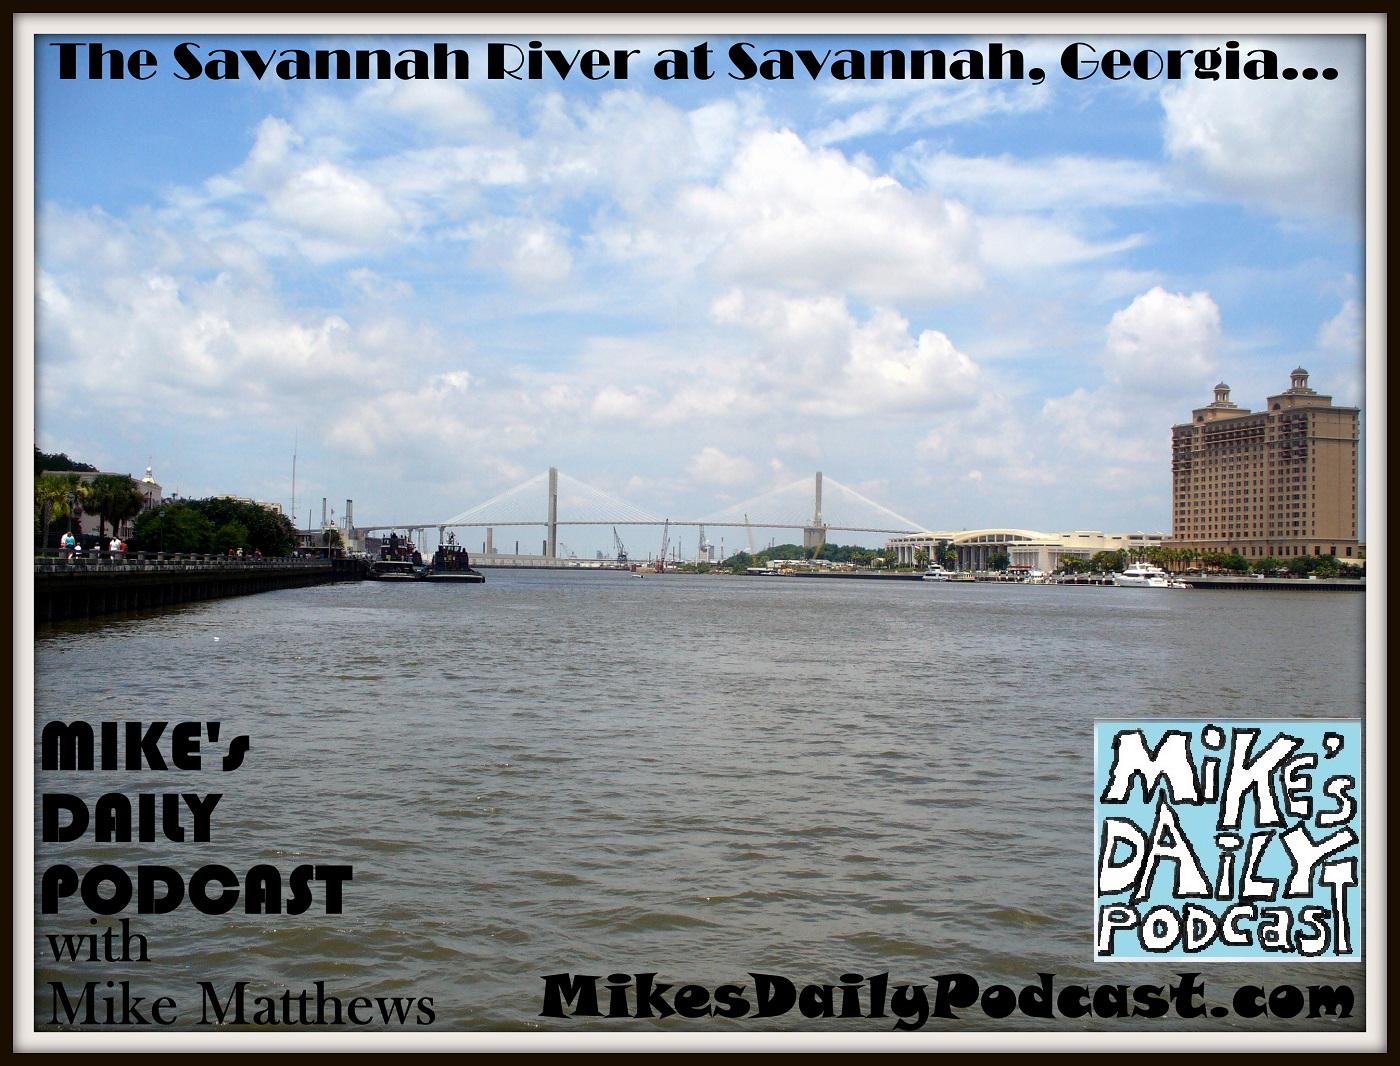 MIKEs DAILY PODCAST 1053 Savannah River